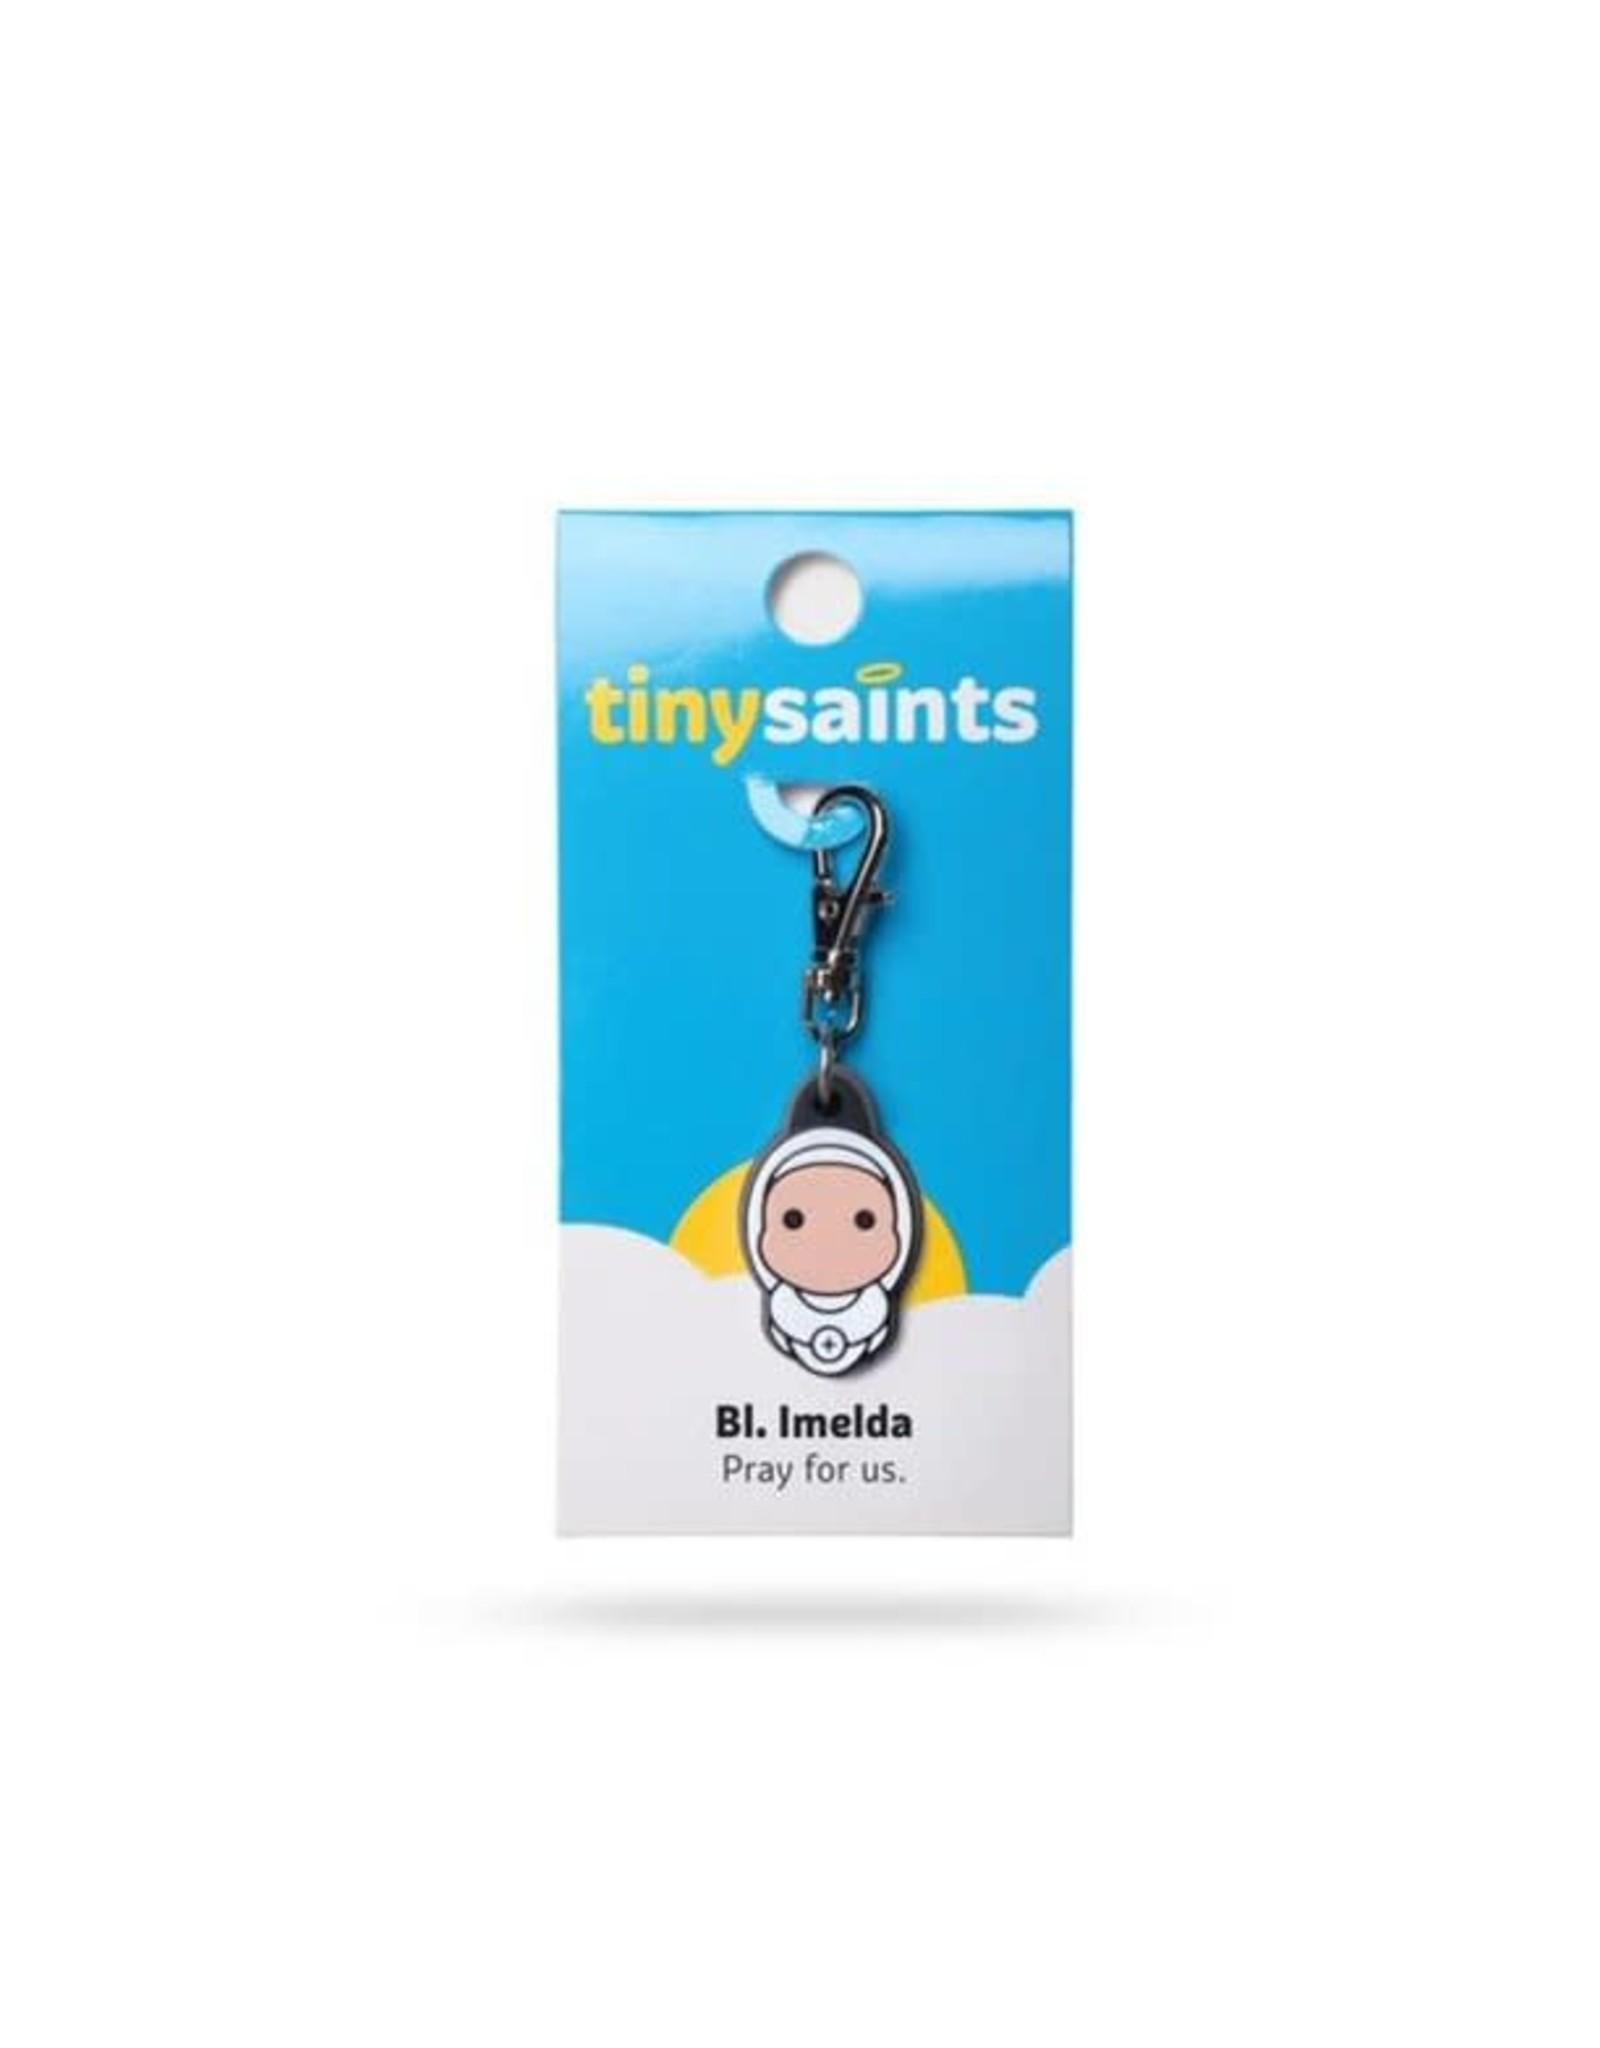 Tiny Saints Tiny Saints Charm - Blessed Imelda